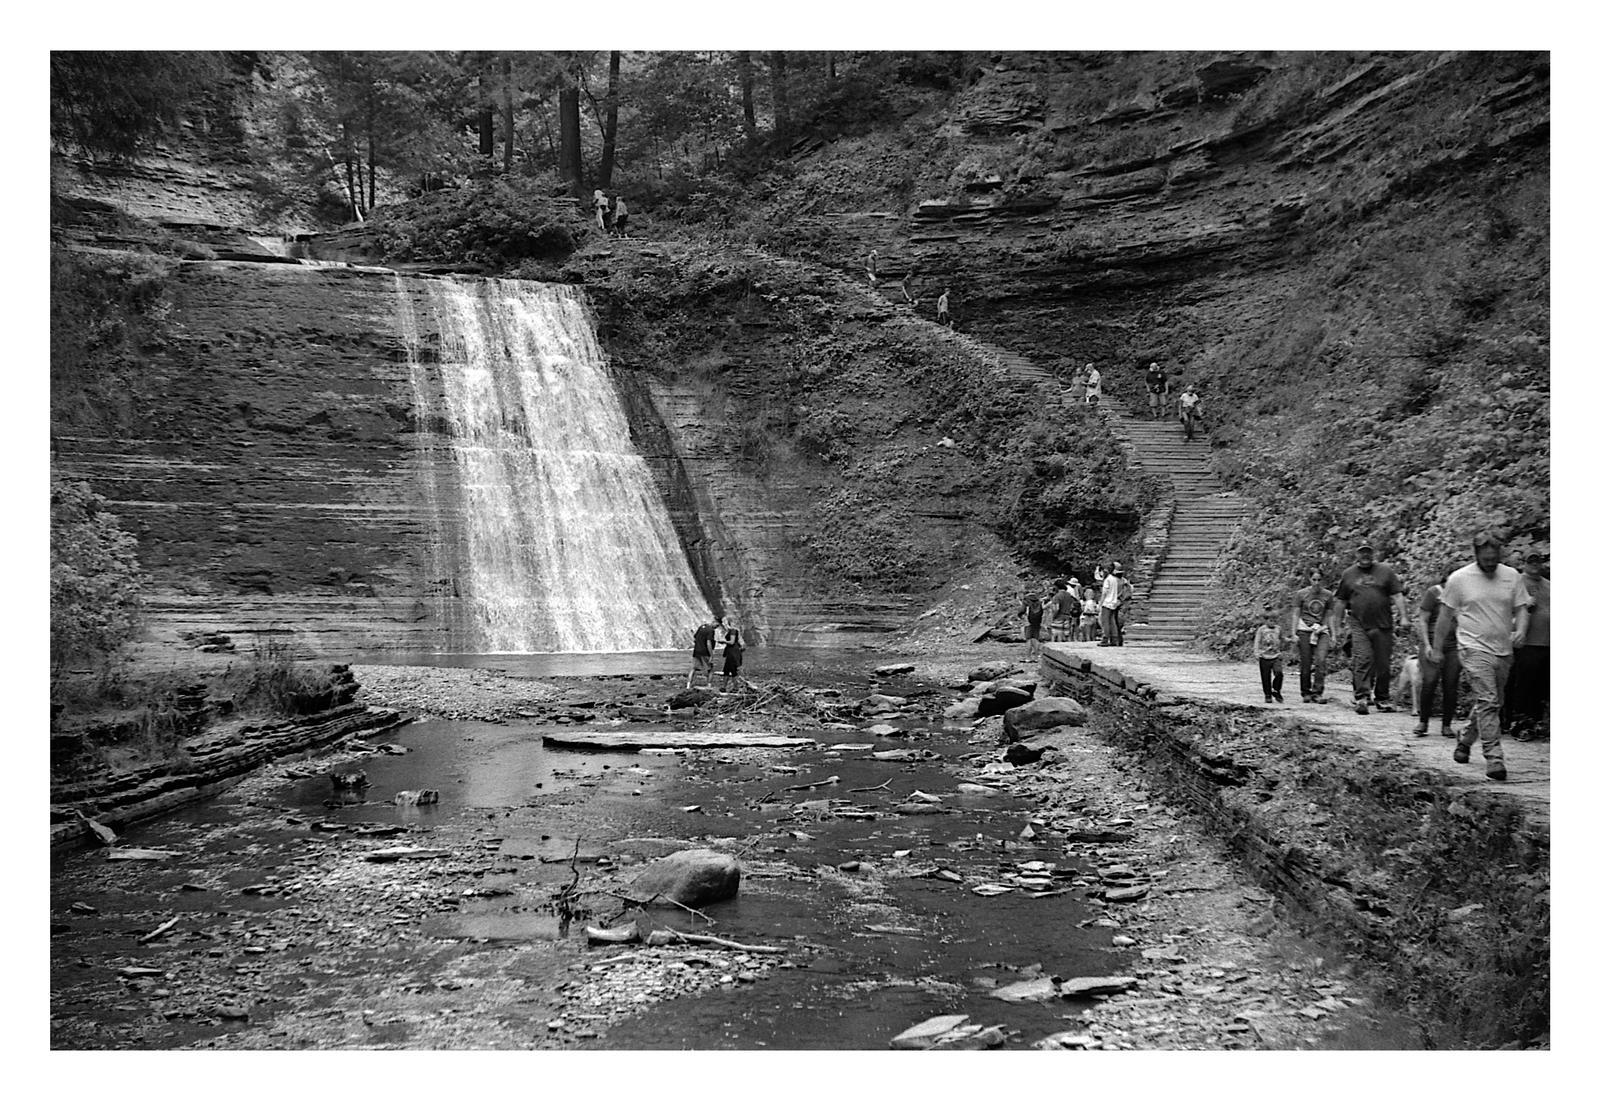 2020-272 Walking the gorge trail